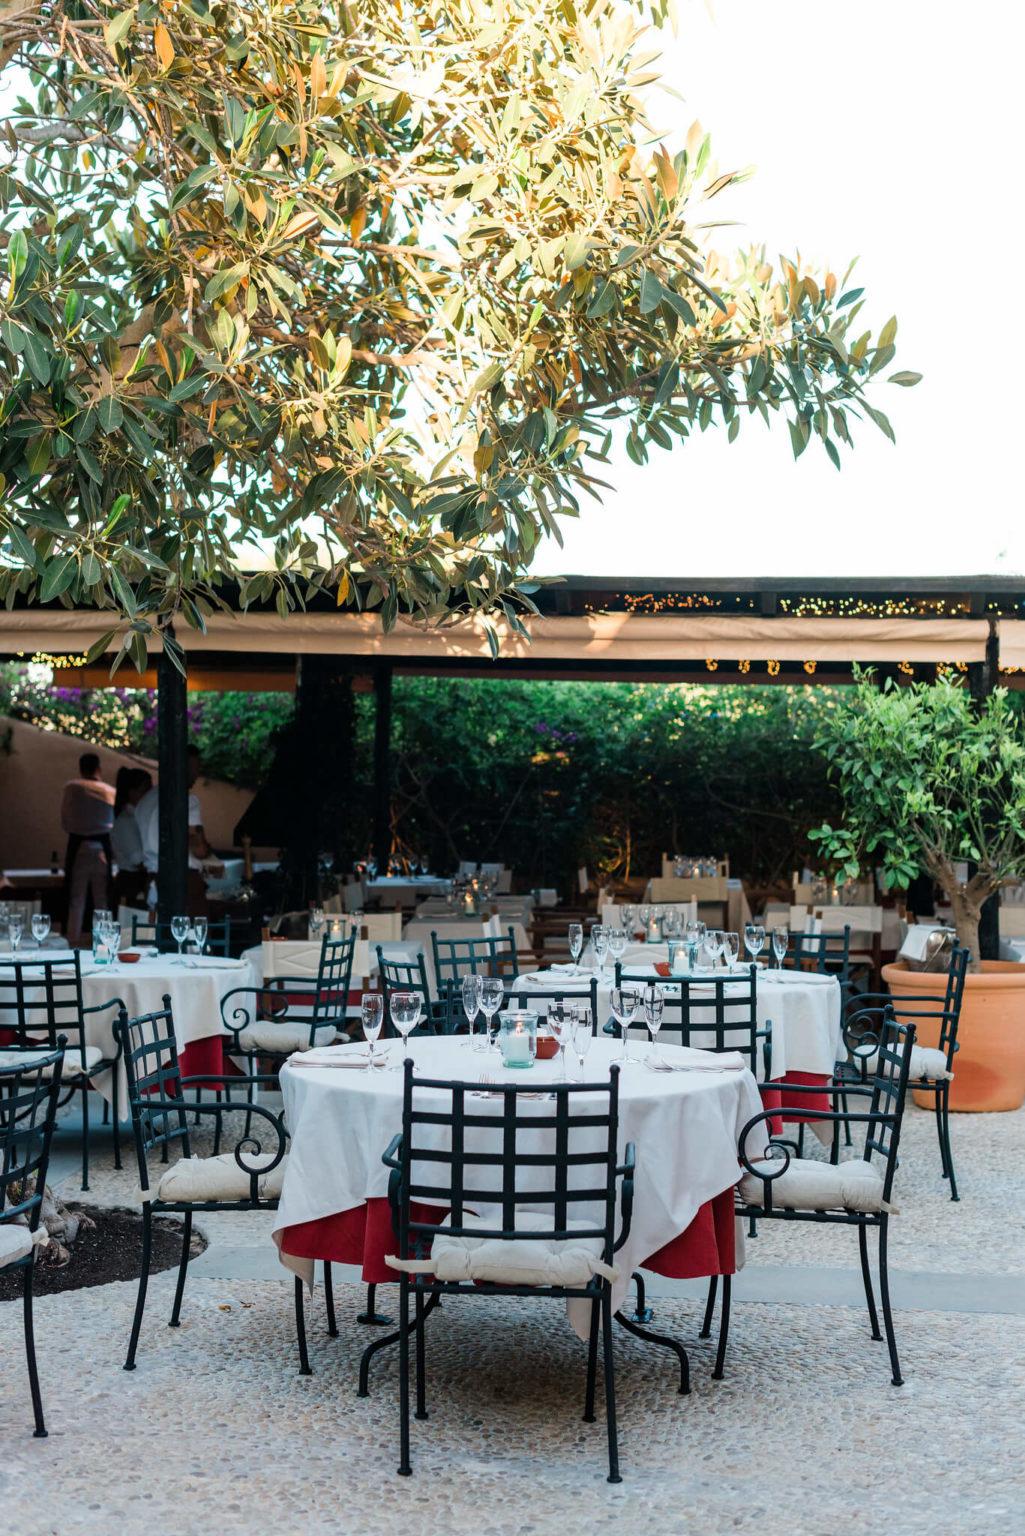 https://www.white-ibiza.com/wp-content/uploads/2020/03/formentera-restaurants-can-carlos-2020-08-1025x1536.jpg